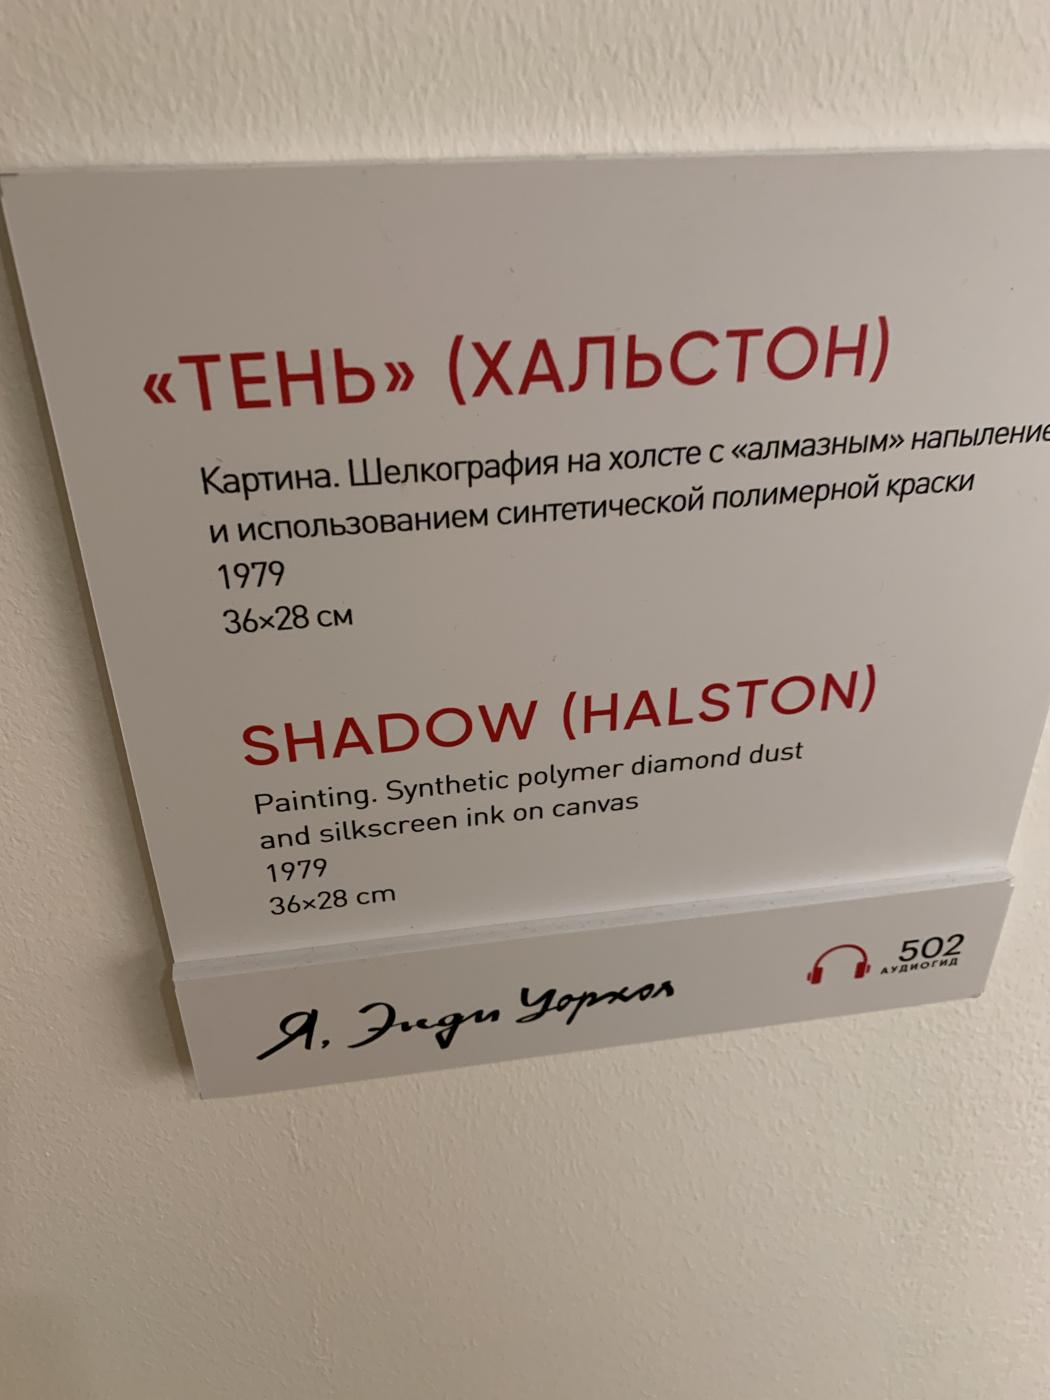 Shadow (Halston)